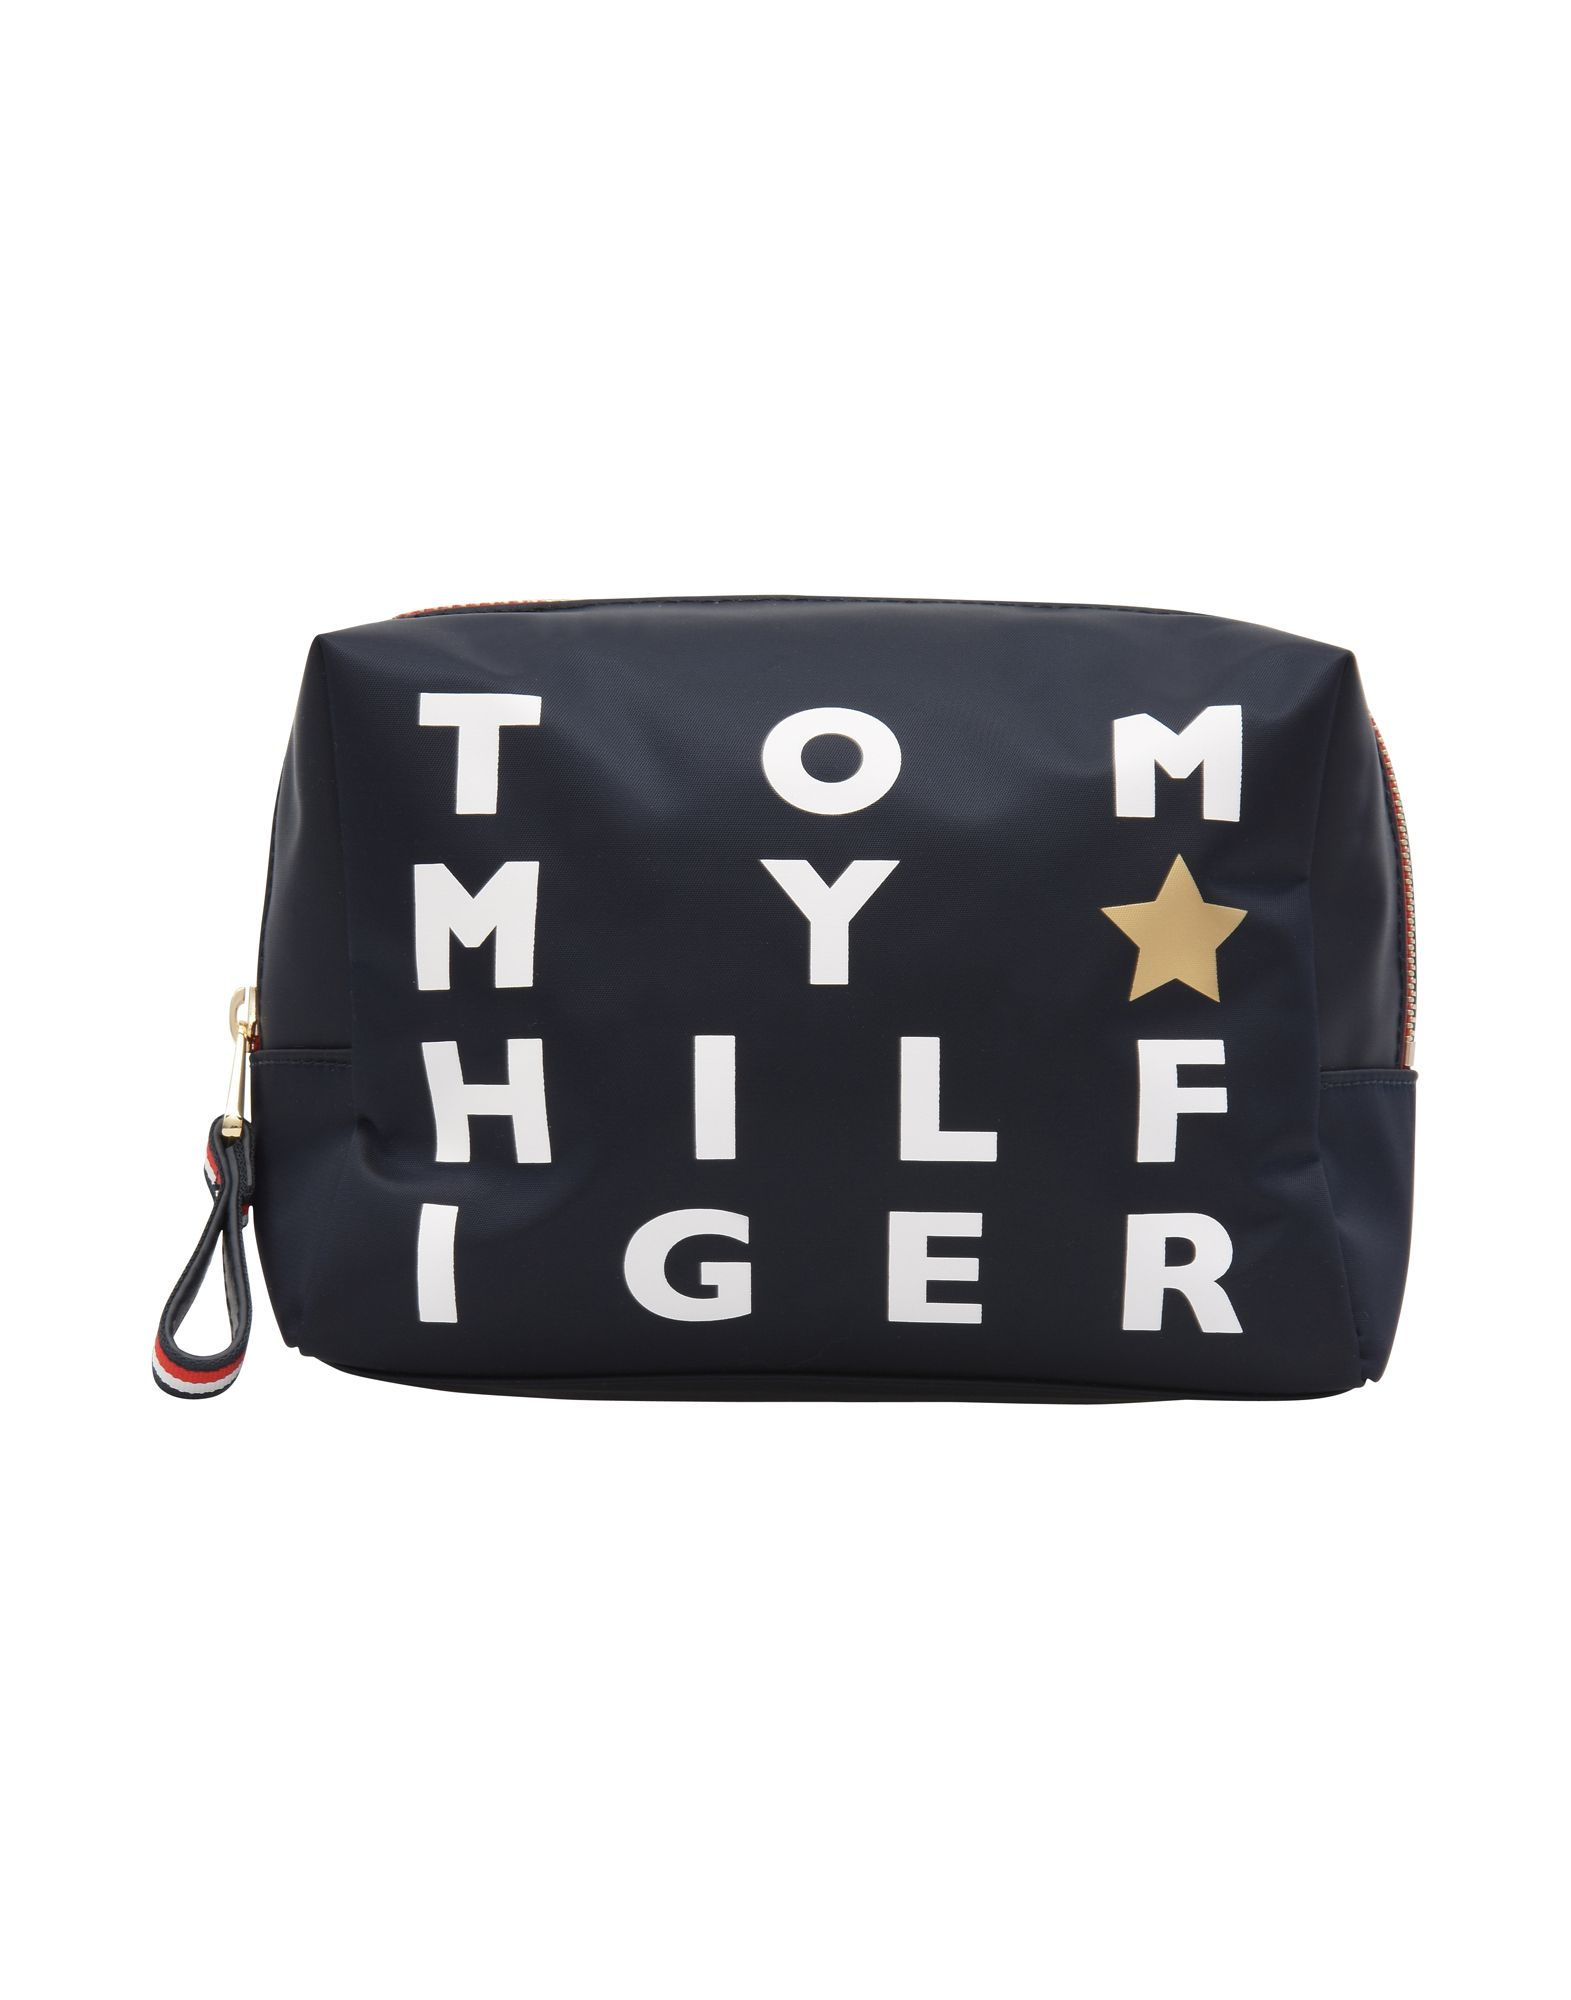 TOMMY HILFIGER Beauty case cath kidston x disney beauty case